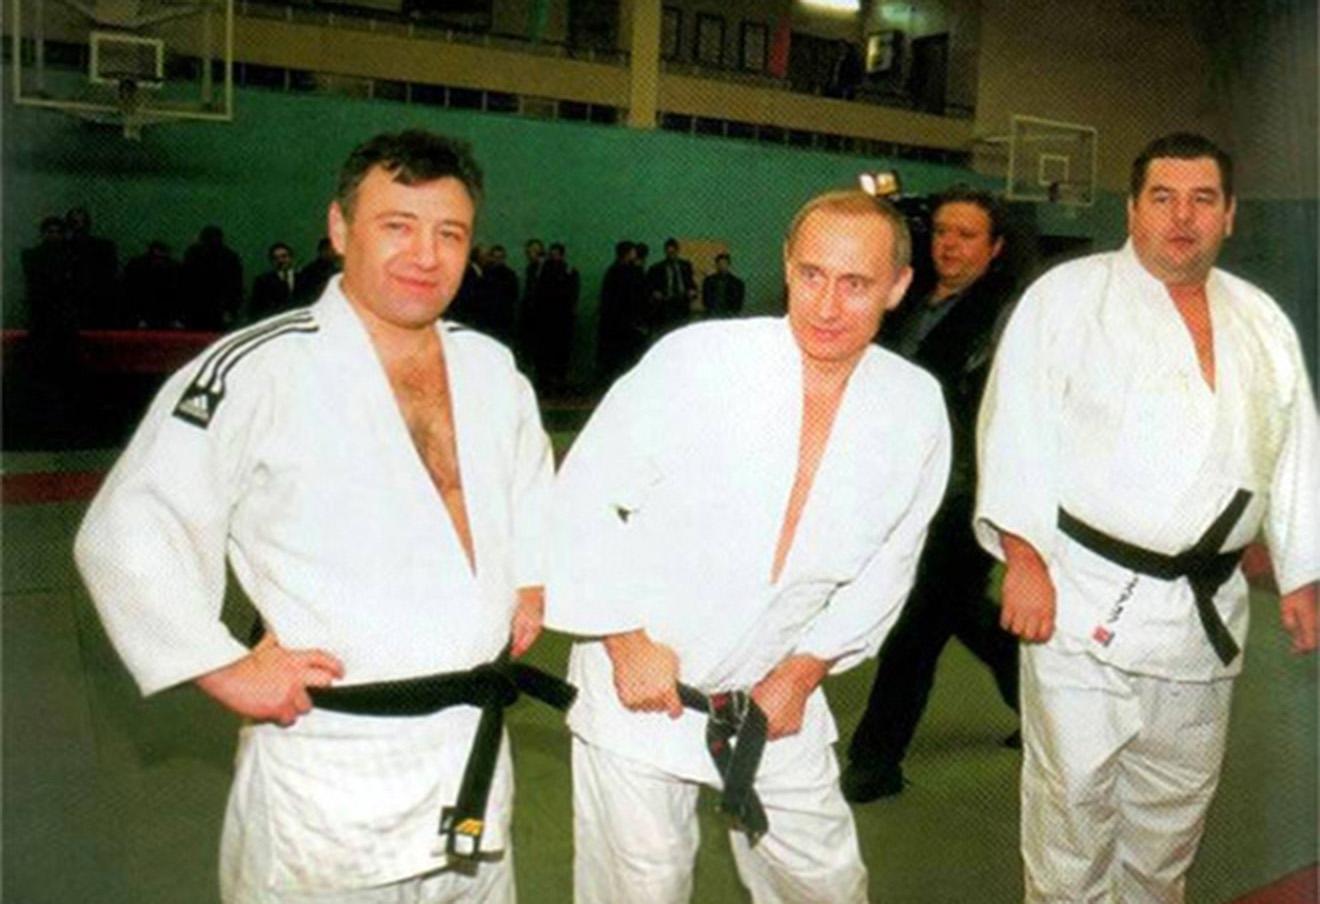 Аркадий Ротенберг, Владимир Путин и Василий Шестаков